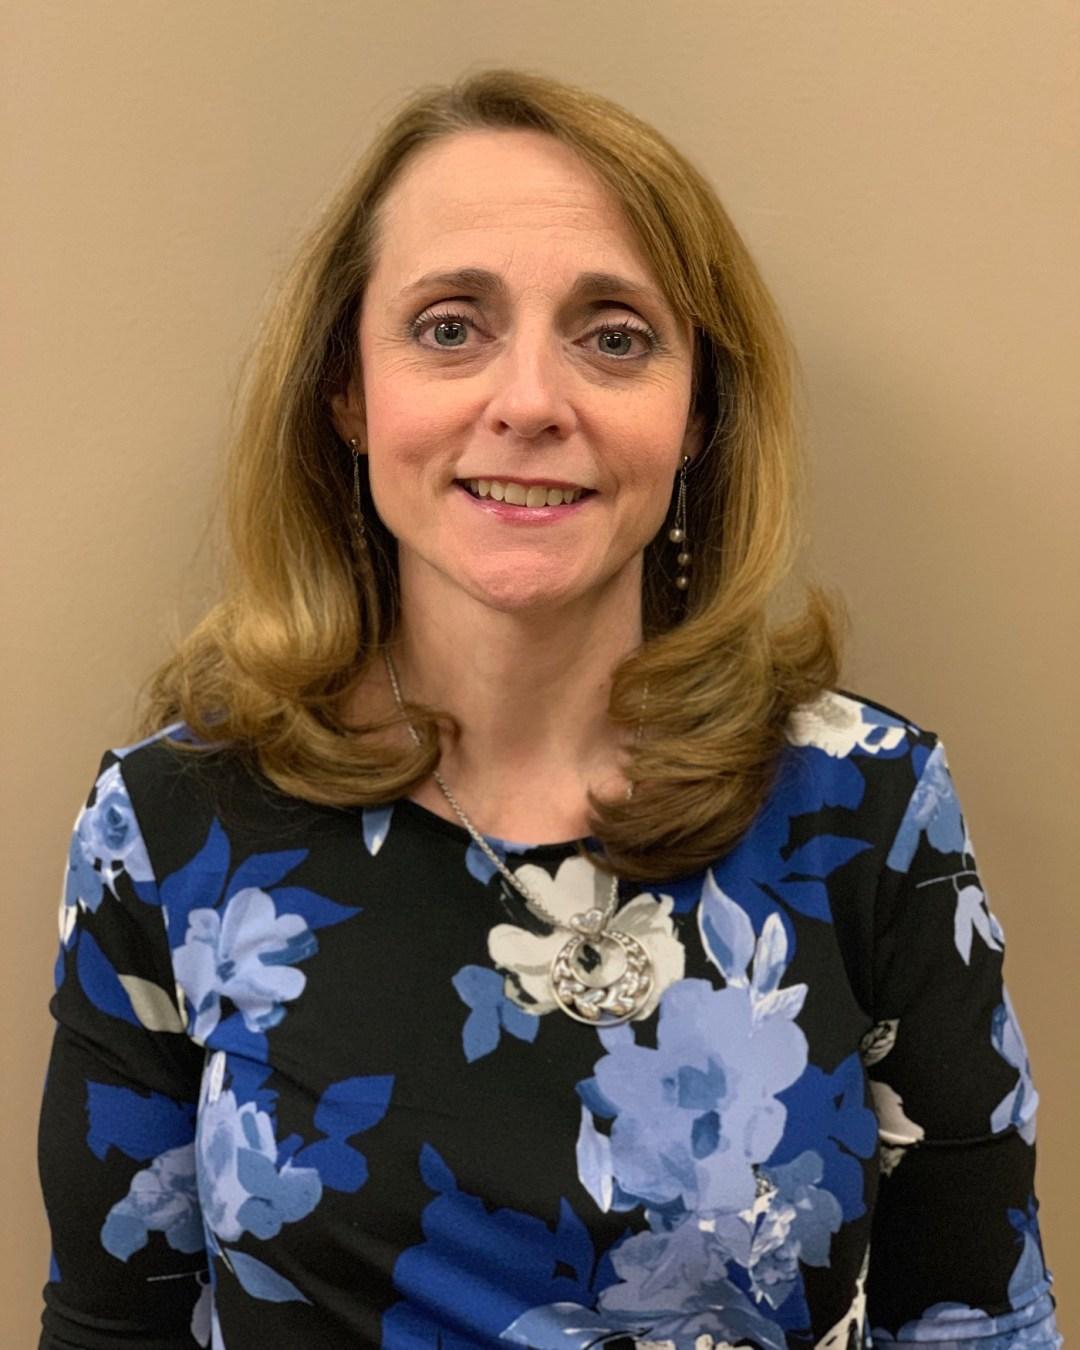 Susan Hallman